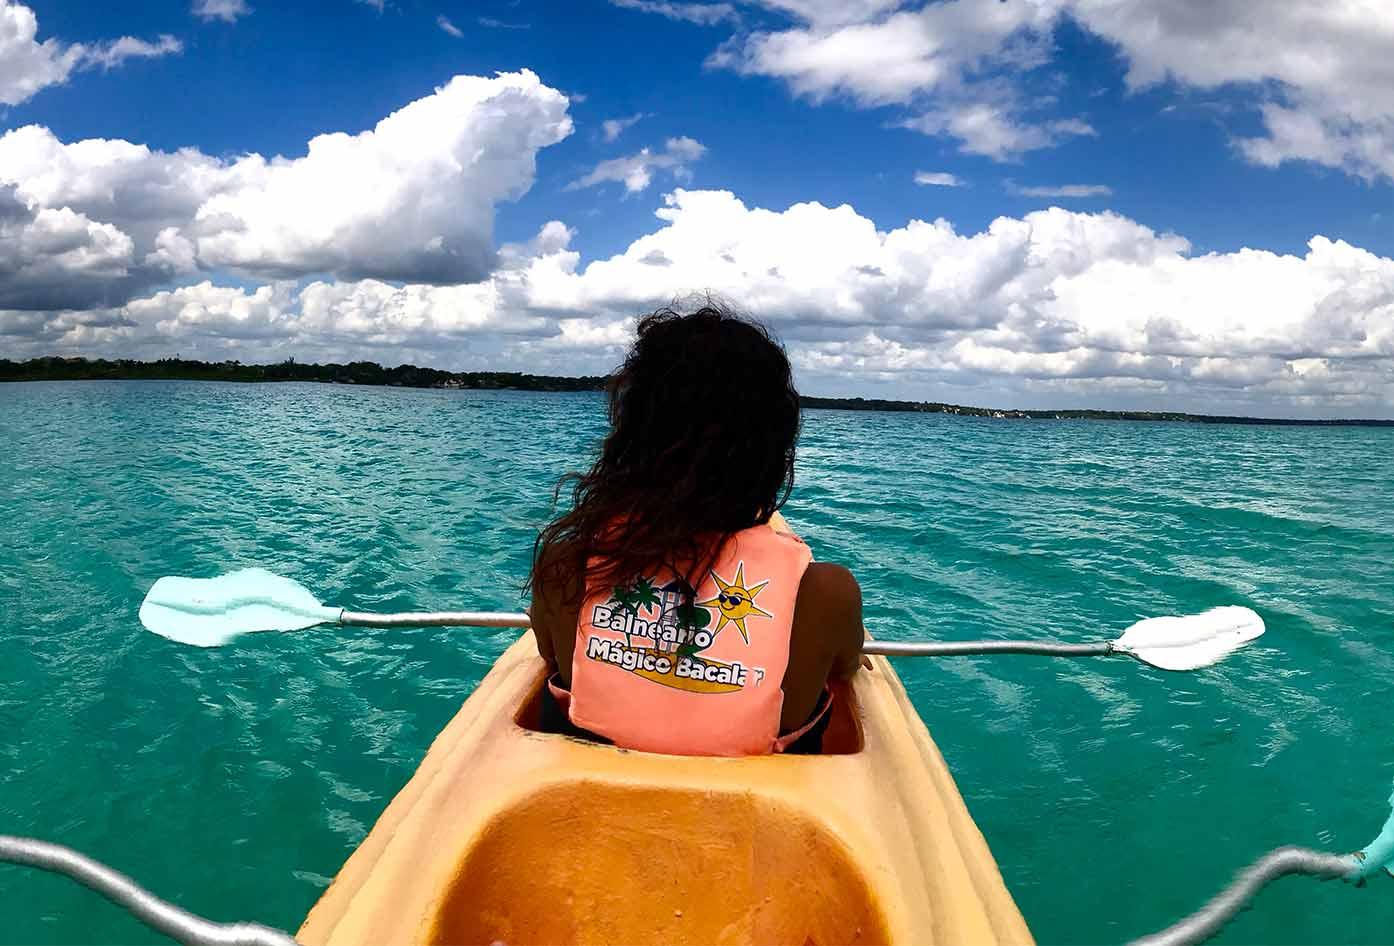 bacalar guide kayak